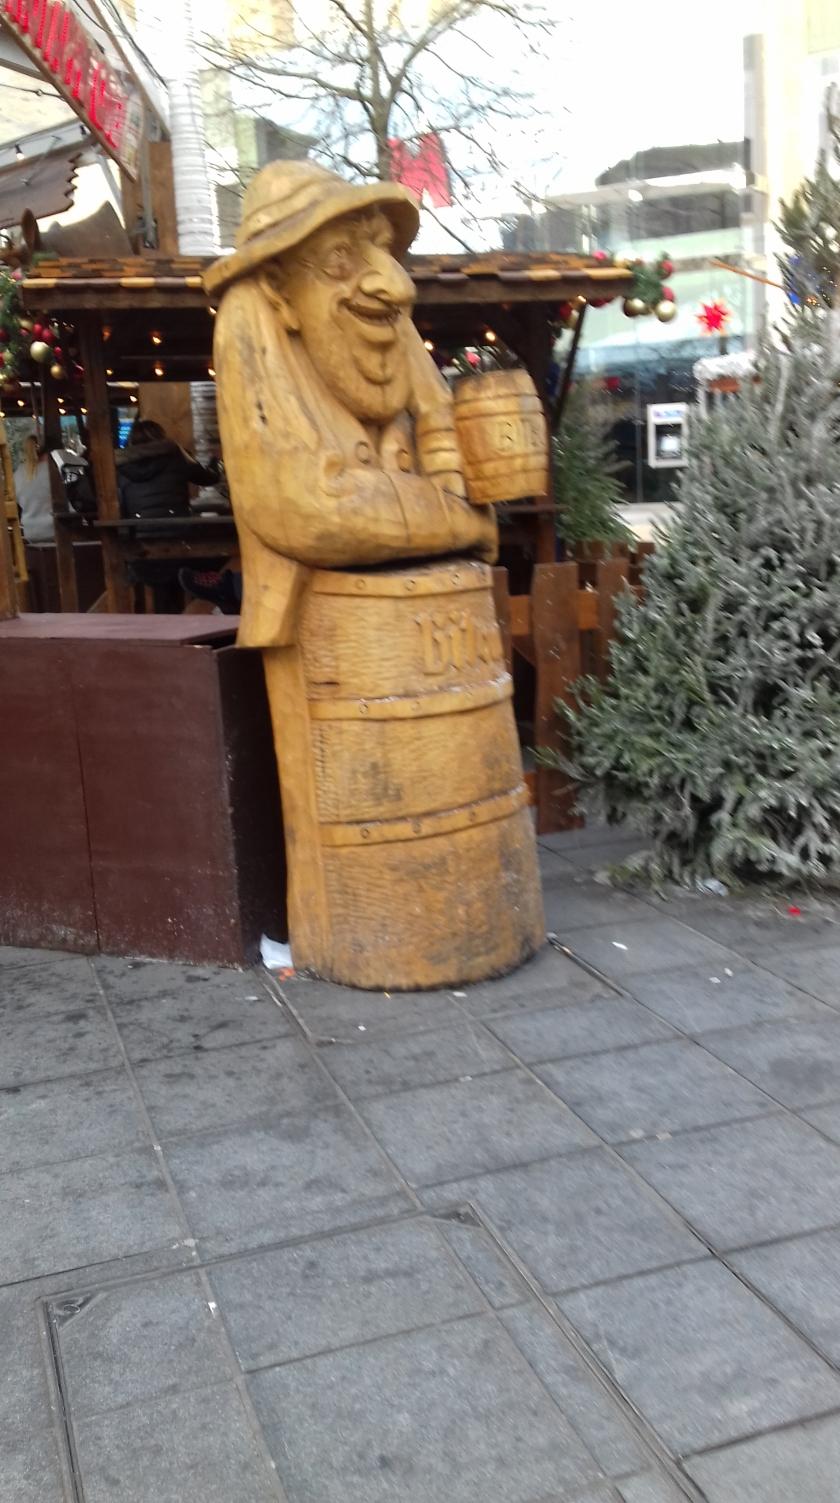 Life size Wooden figure in the German market Broadmead Bristol #Bristmas